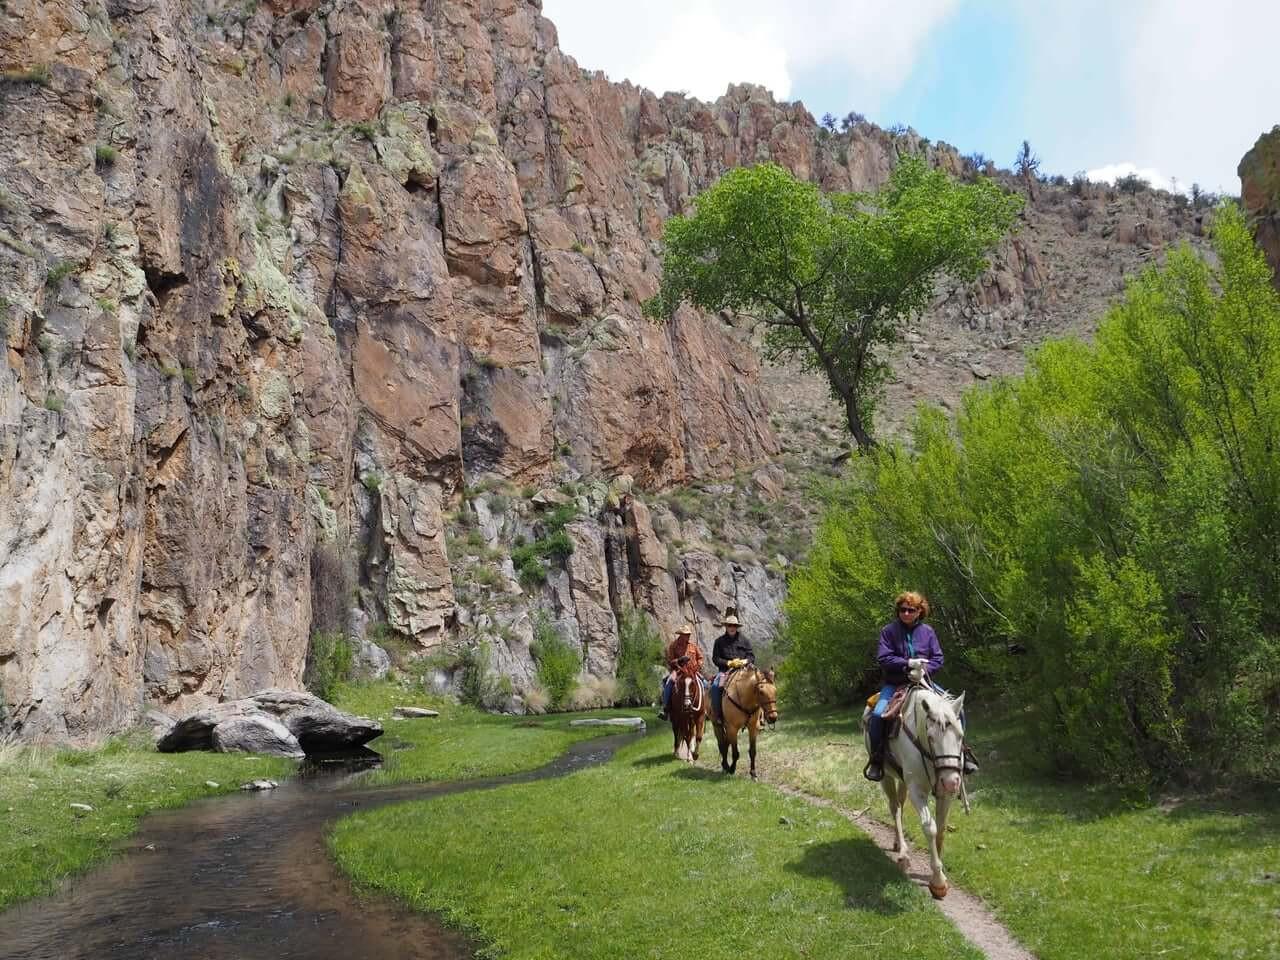 trail_riding_41-1.jpg